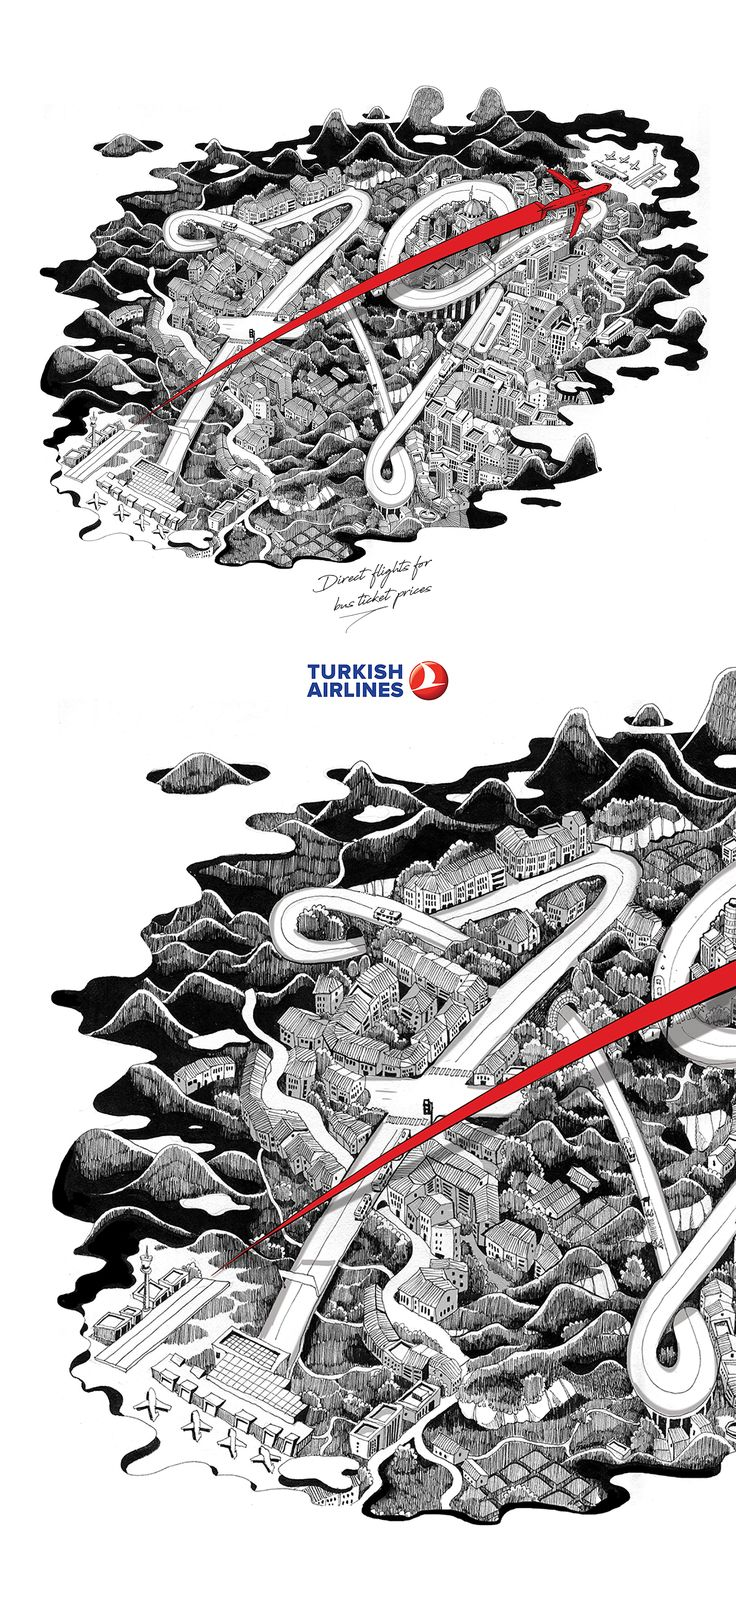 ADS FOR TURKISH AIRLINES AGENCY MULLENLOWE IST COPYWRITER CAN YALCIN  ART DIRECTOR CETIN YILDIZ ILLUSTRATOR NUOMI FROM TAIWAN